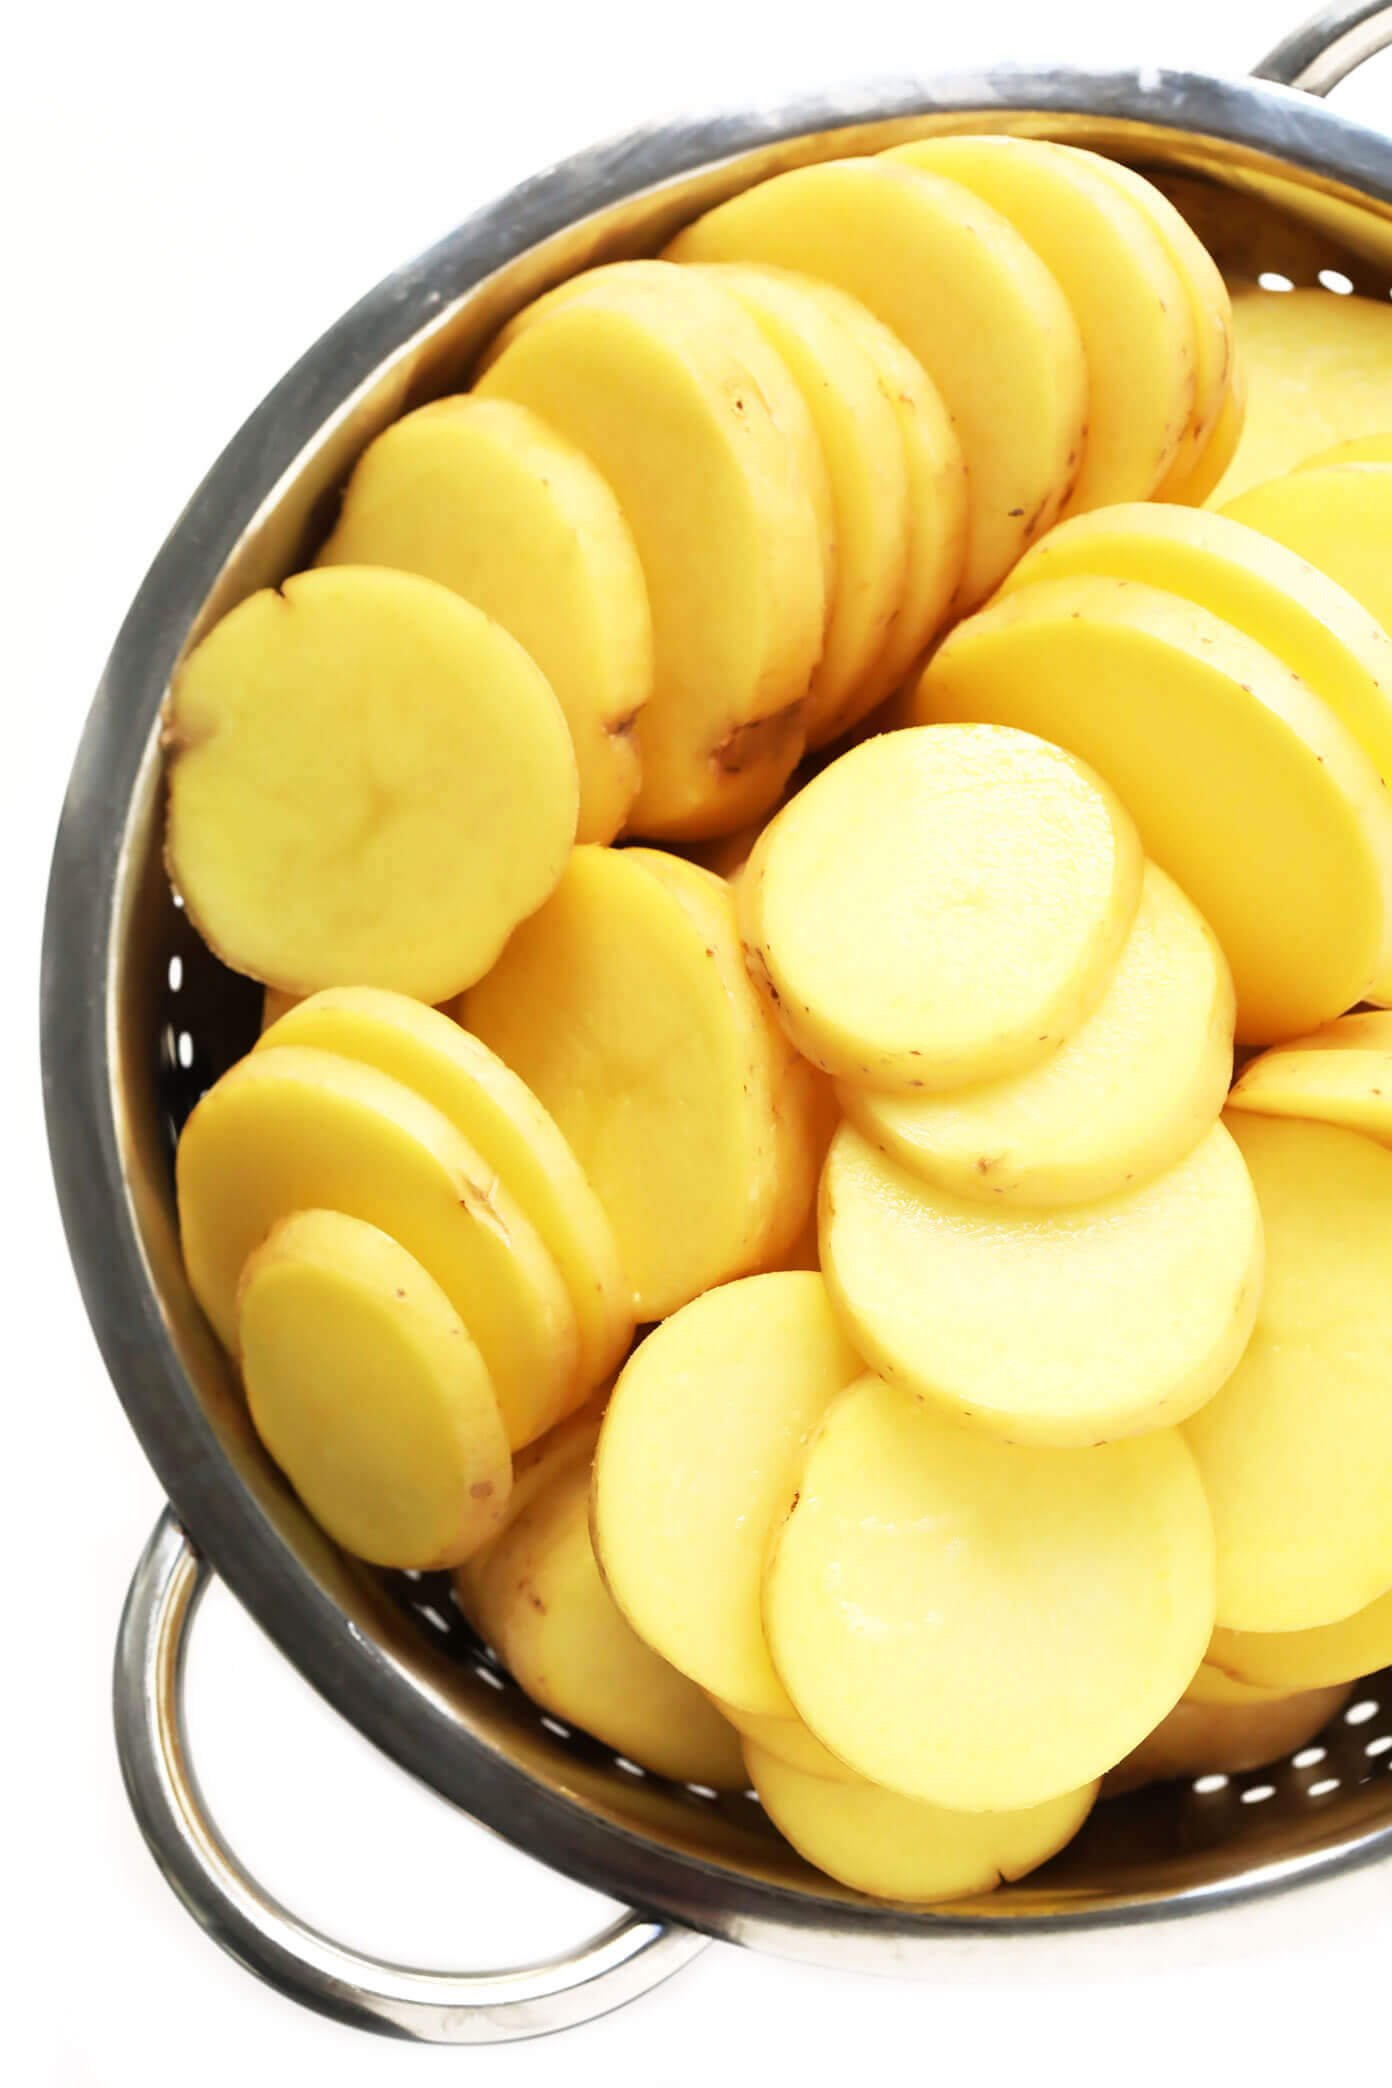 Yukon Gold Potatoes for Scalloped Potatoes